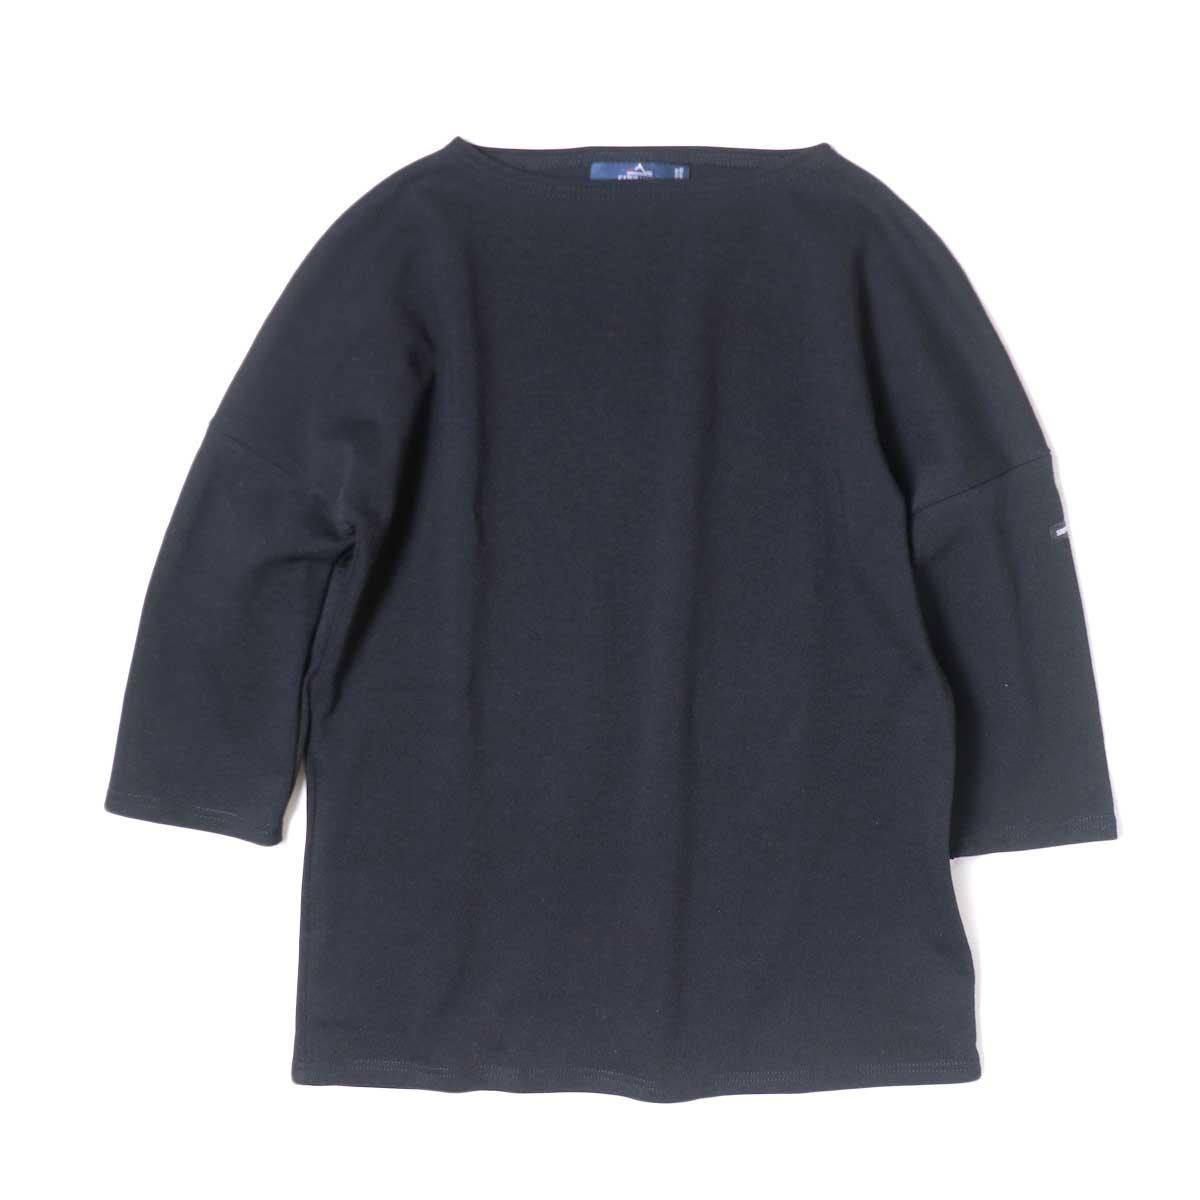 SAINT JAMES / CRAZSLOU (七分袖ドロップショルダー)(Noir) 正面